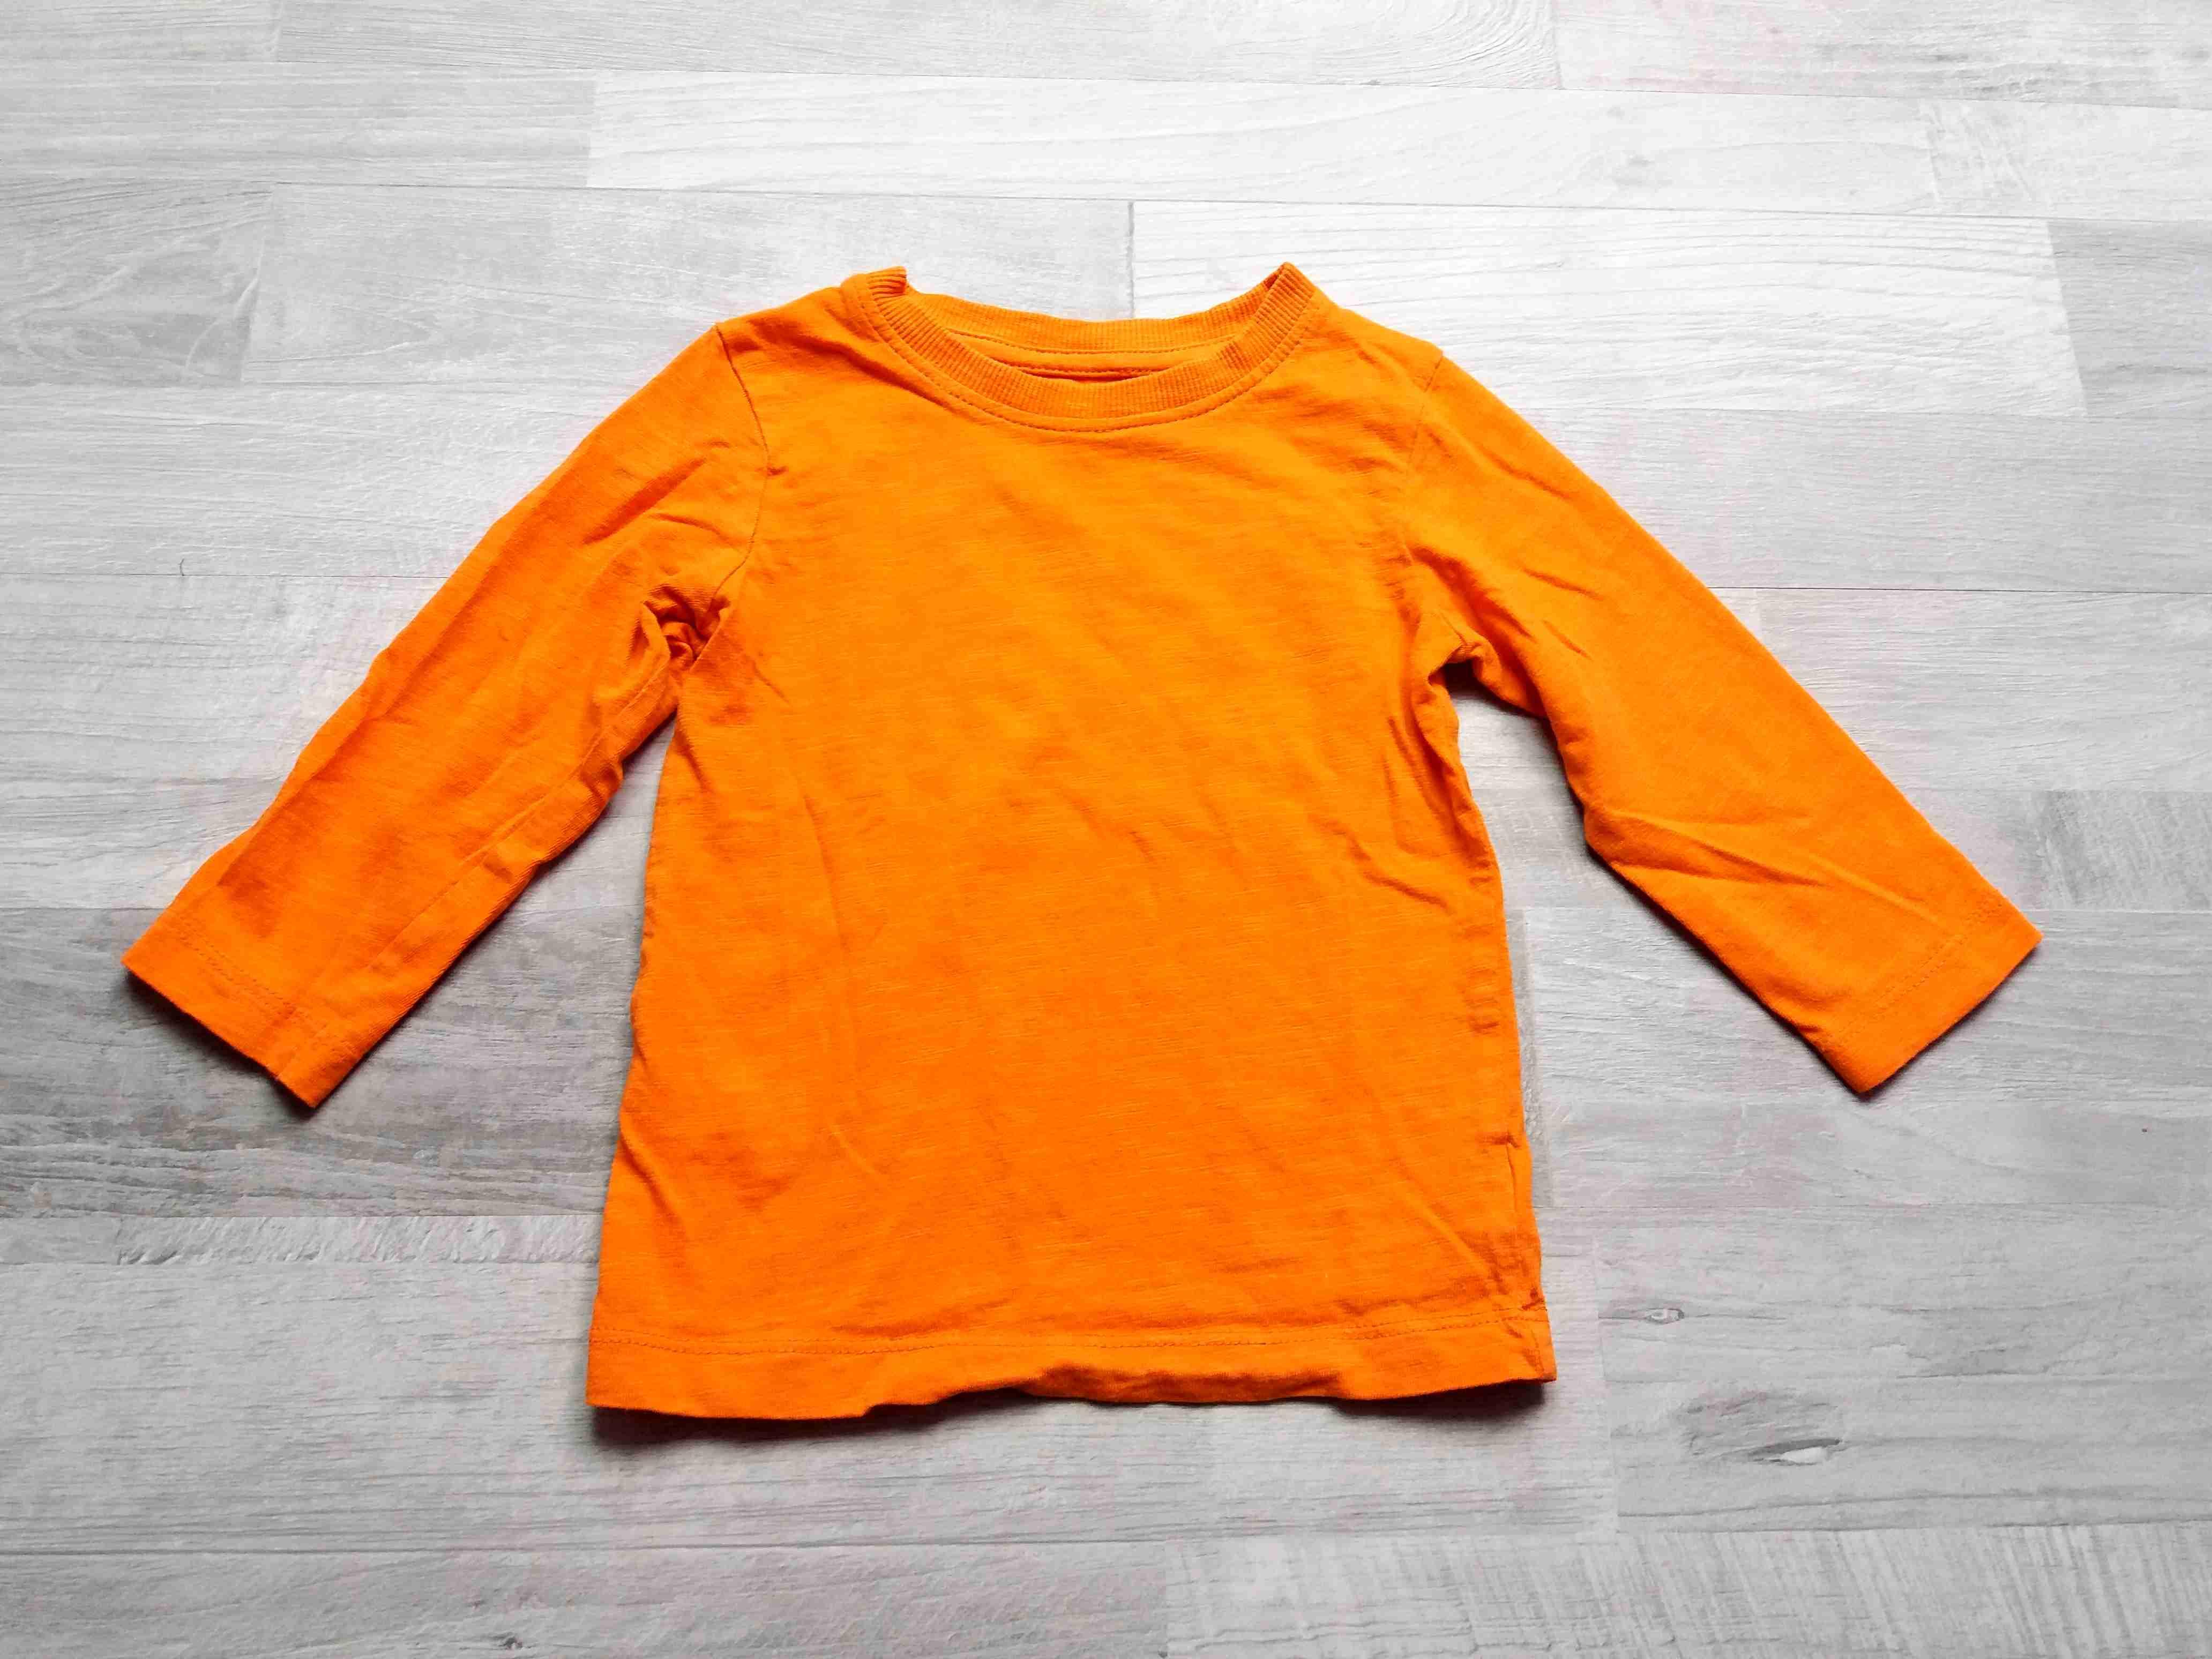 ccc21eefe81 tričko dl.rukáv oranžové NEXT vel 80